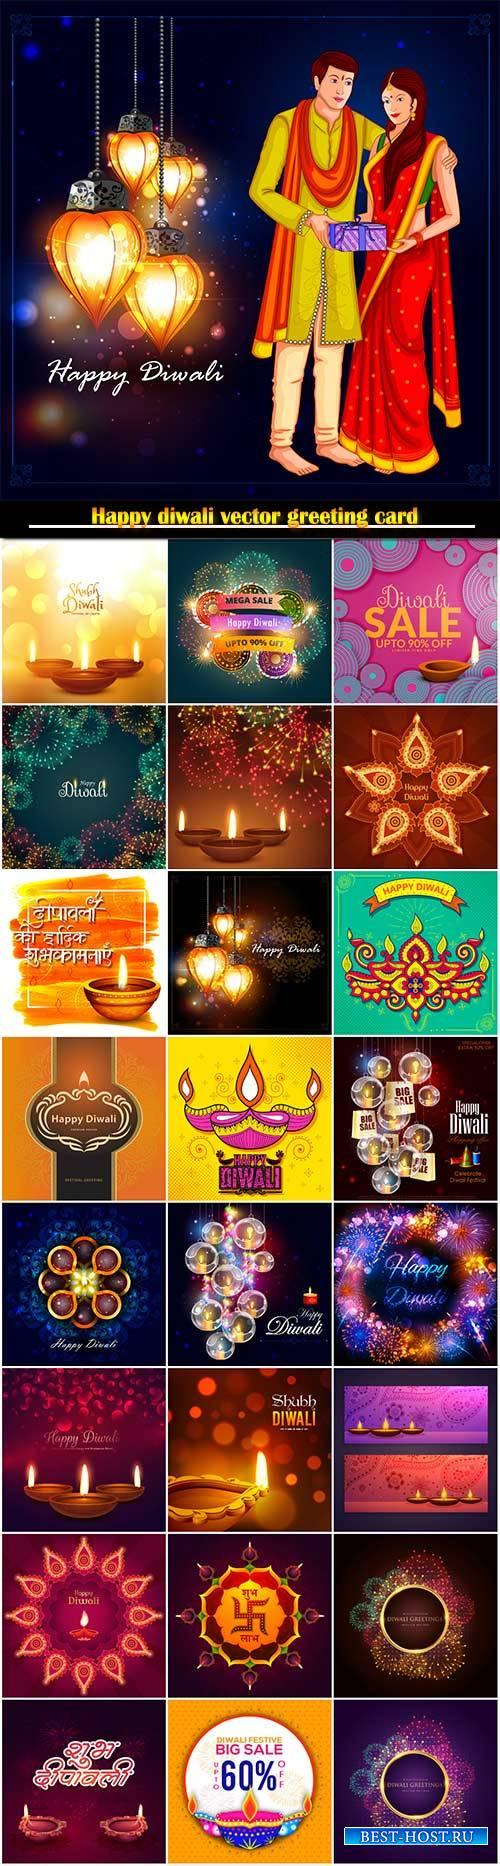 Happy diwali vector greeting card # 3